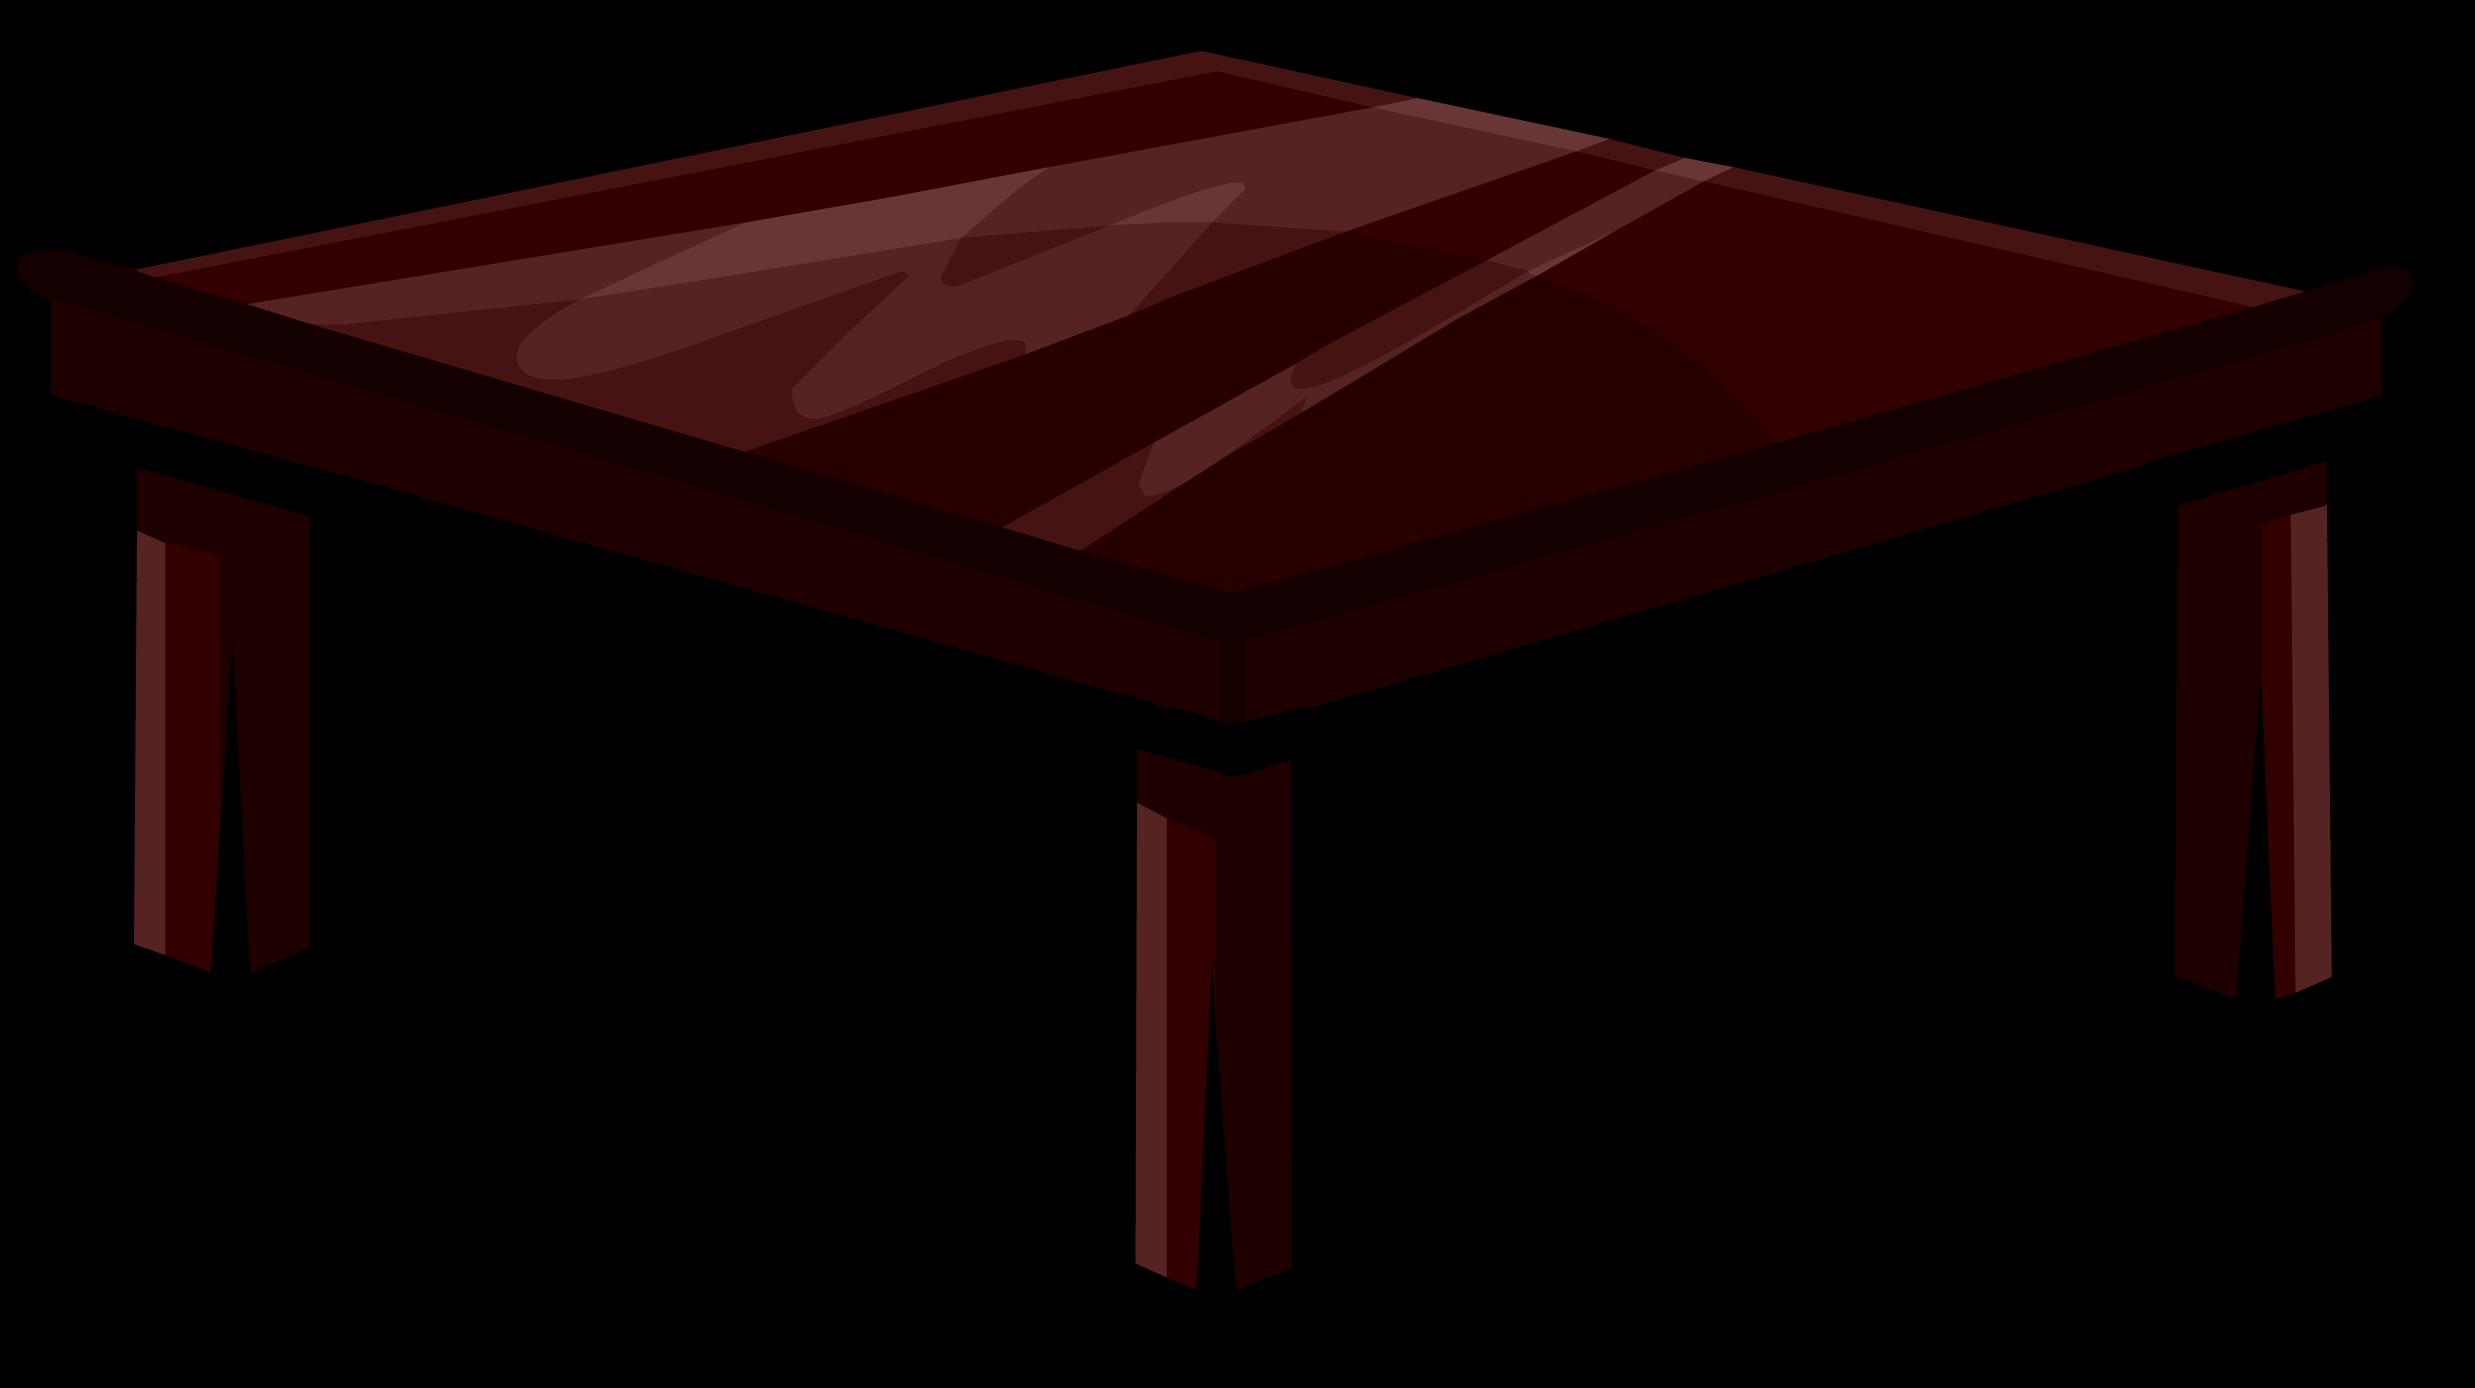 Desk clipart square table. Image tea sprite png